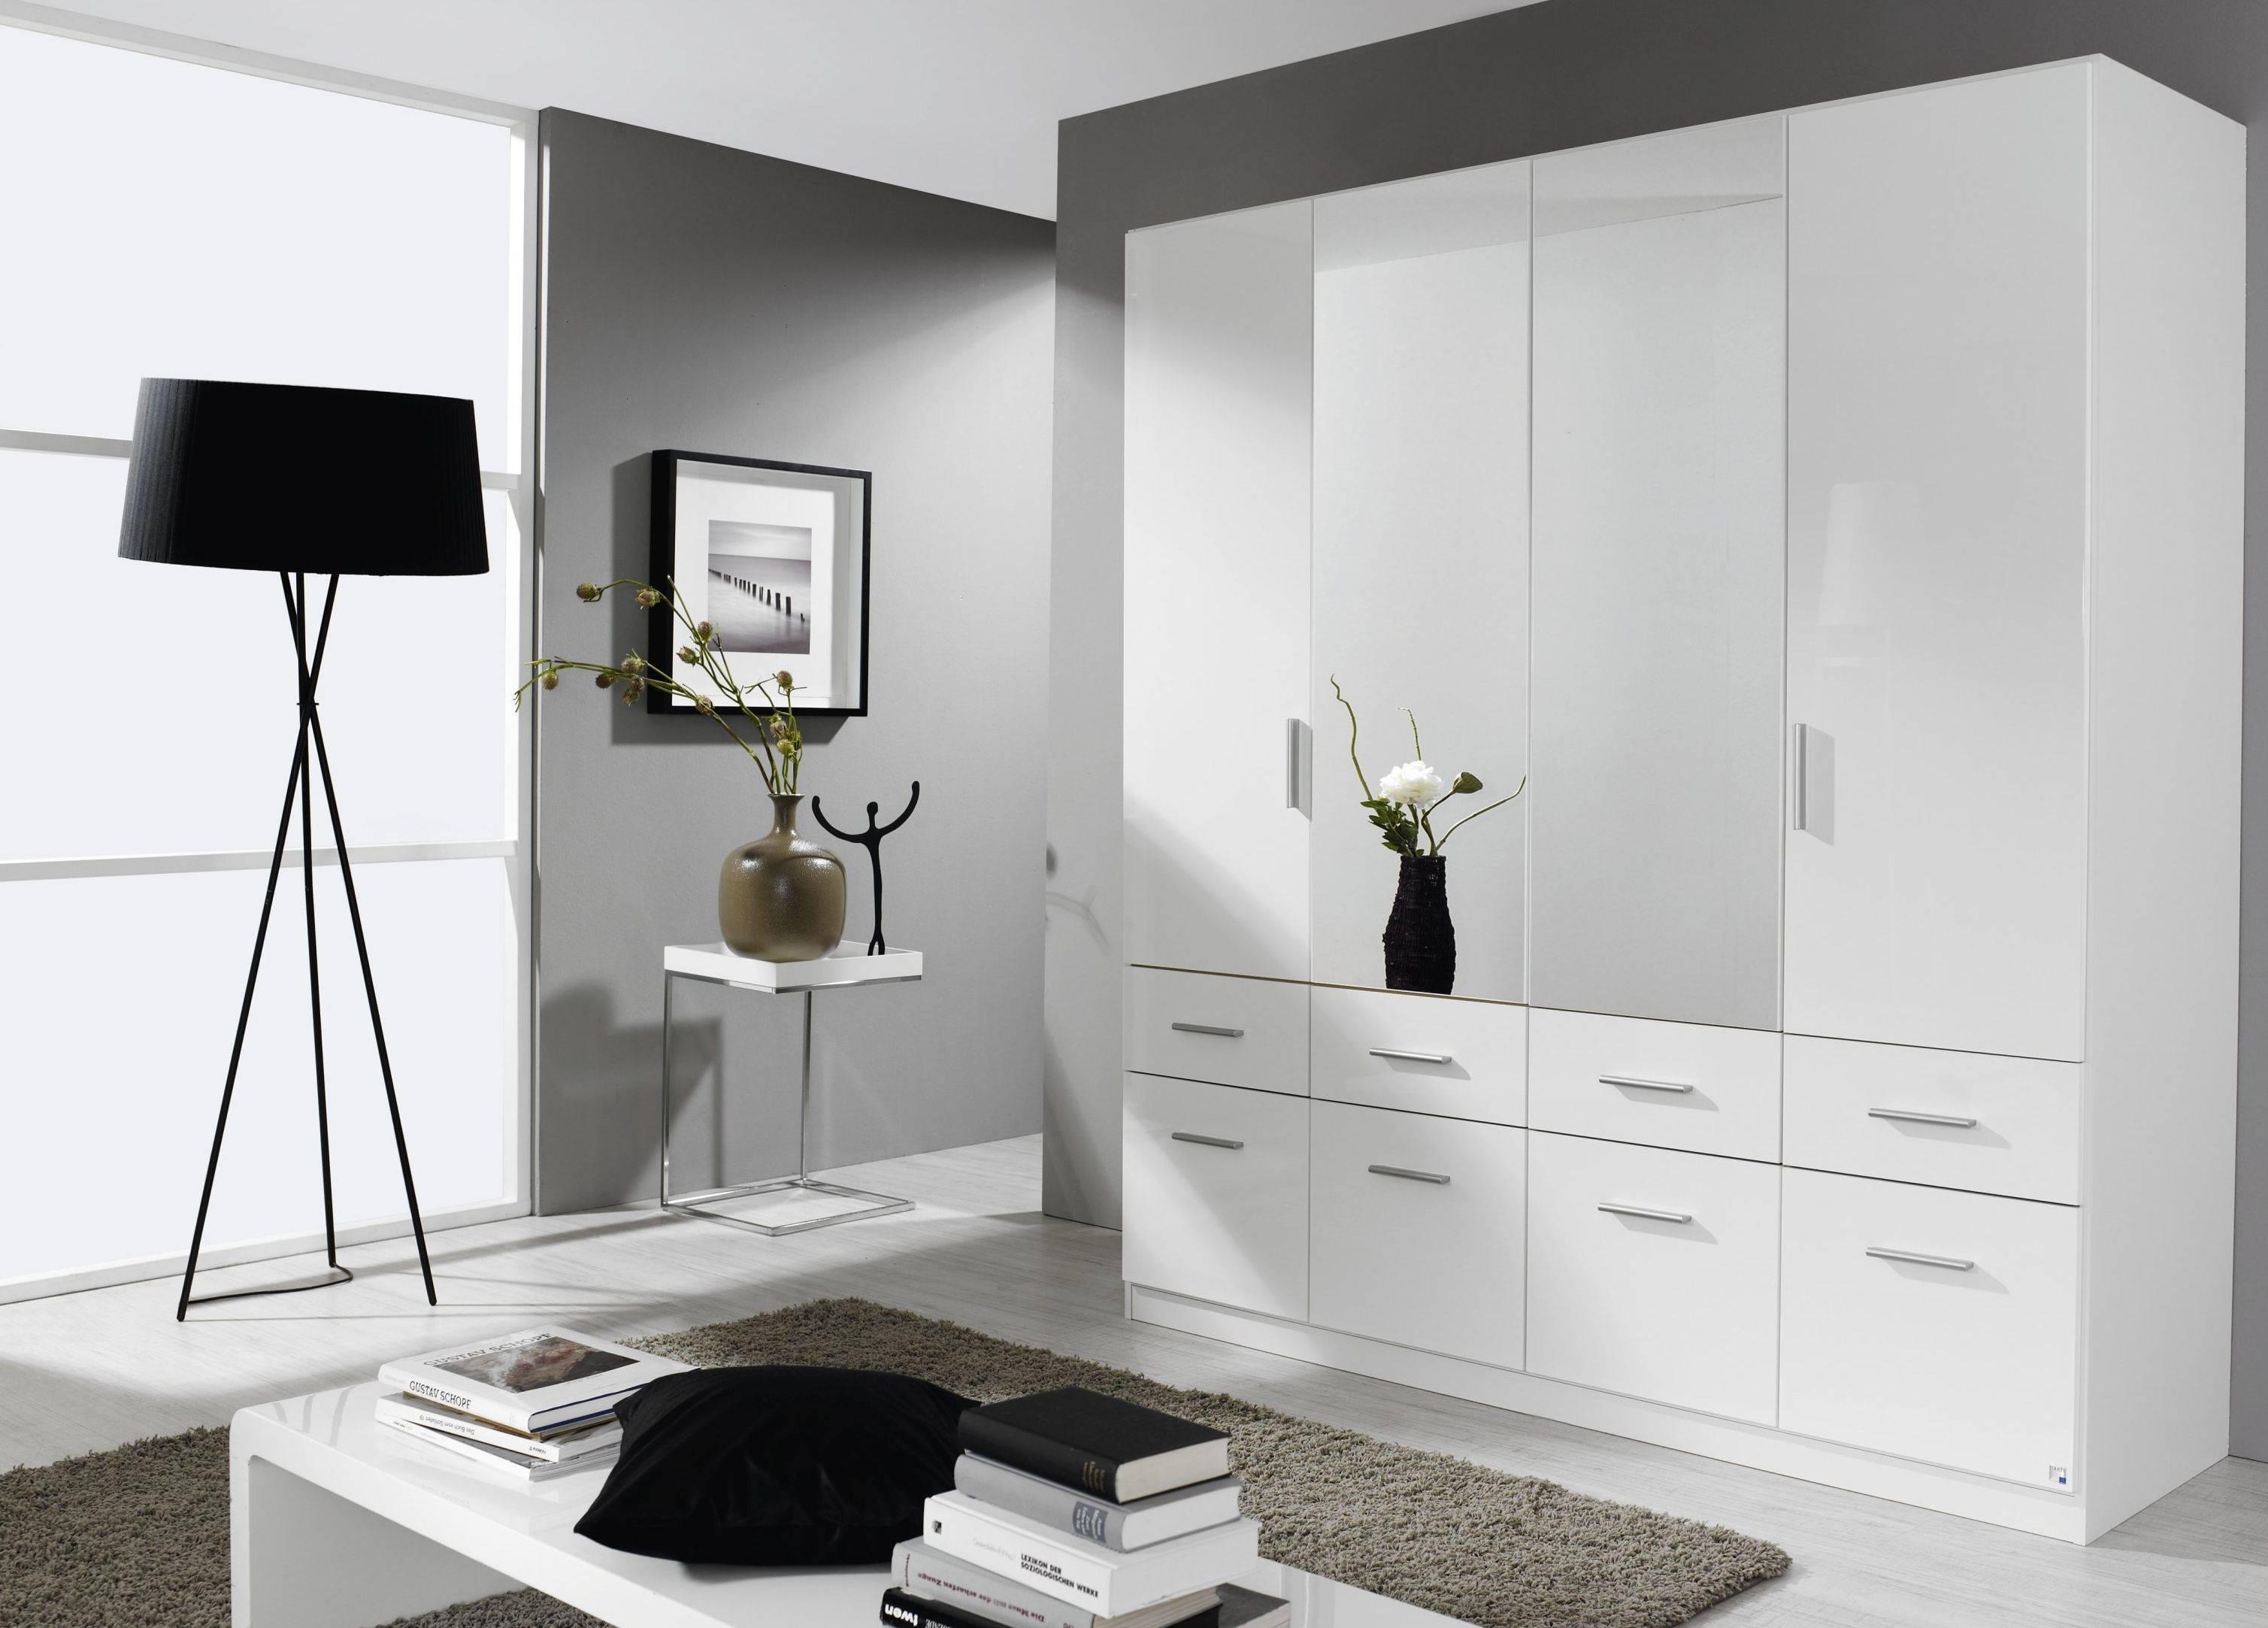 Buy Rauch Celle Wardrobe Online - Cfs Uk in Rauch Wardrobes (Image 1 of 15)